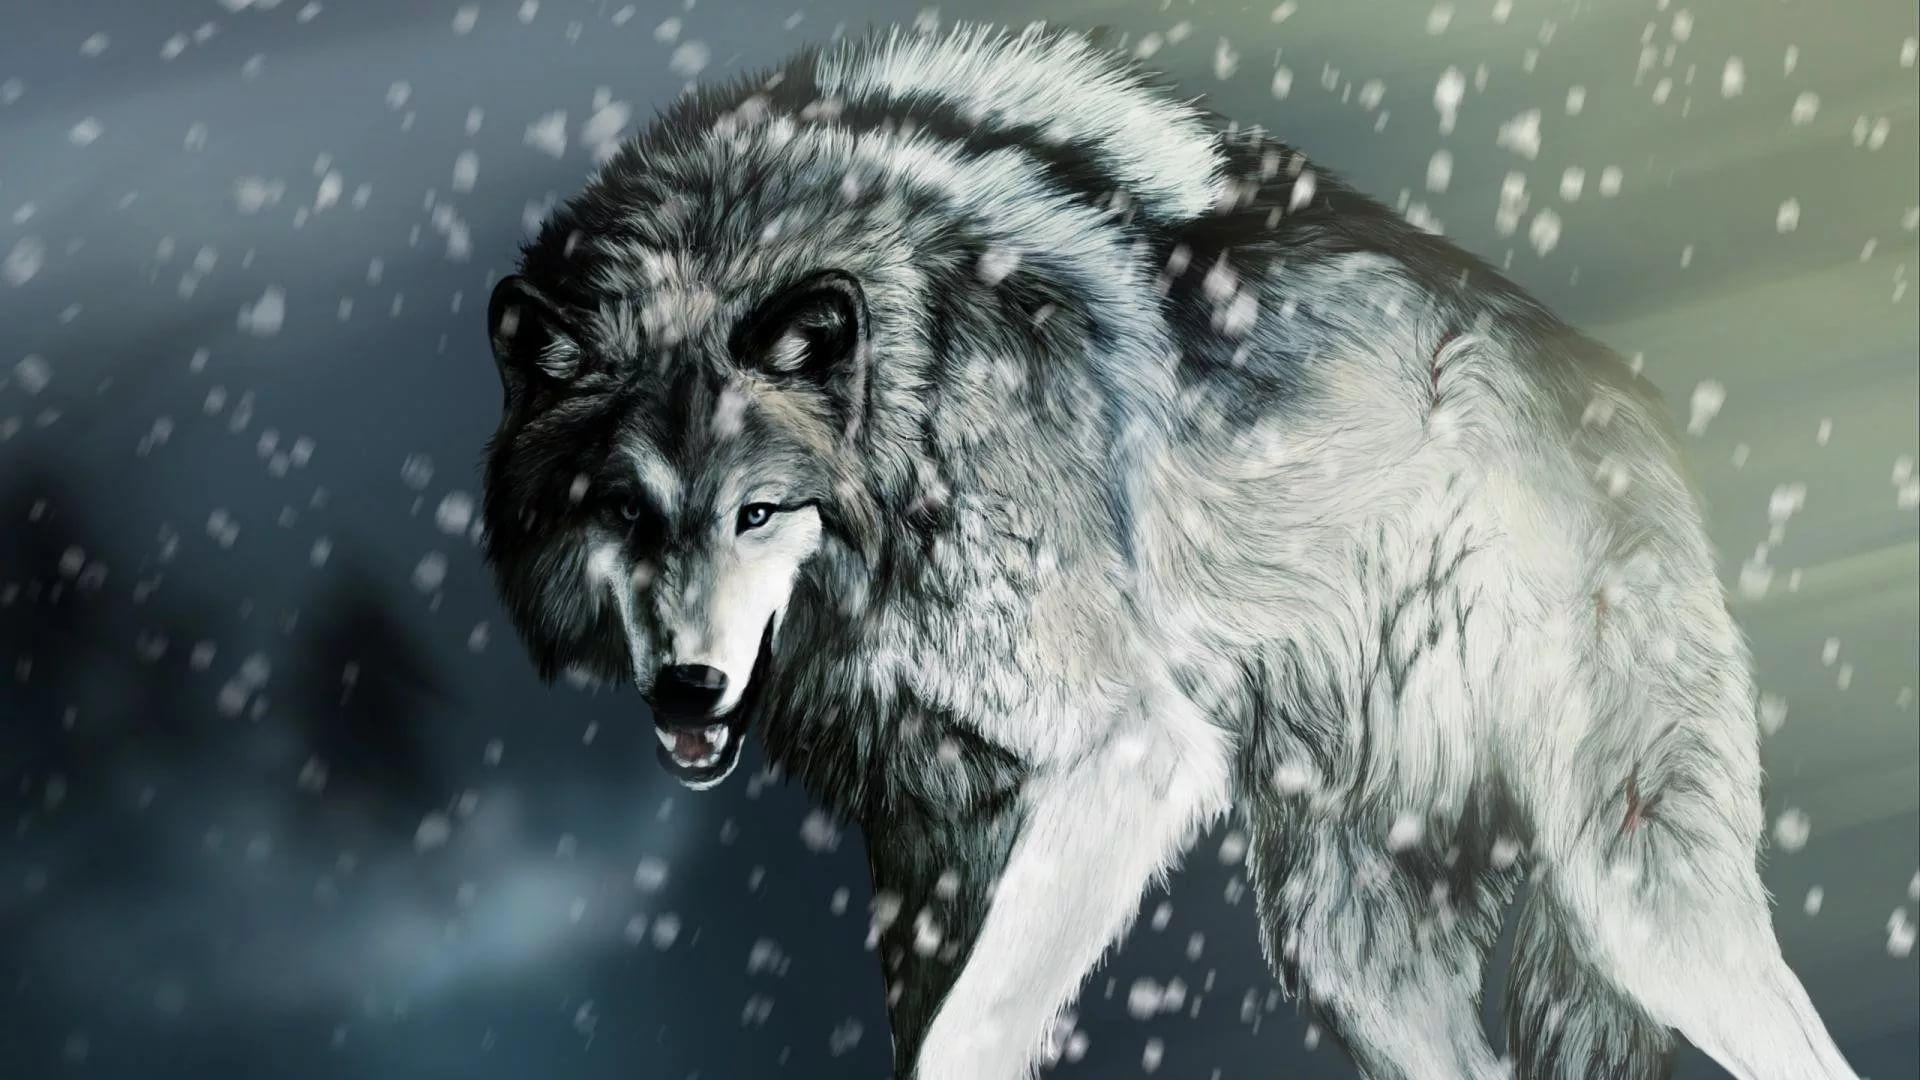 Cool Wolf PC Wallpaper